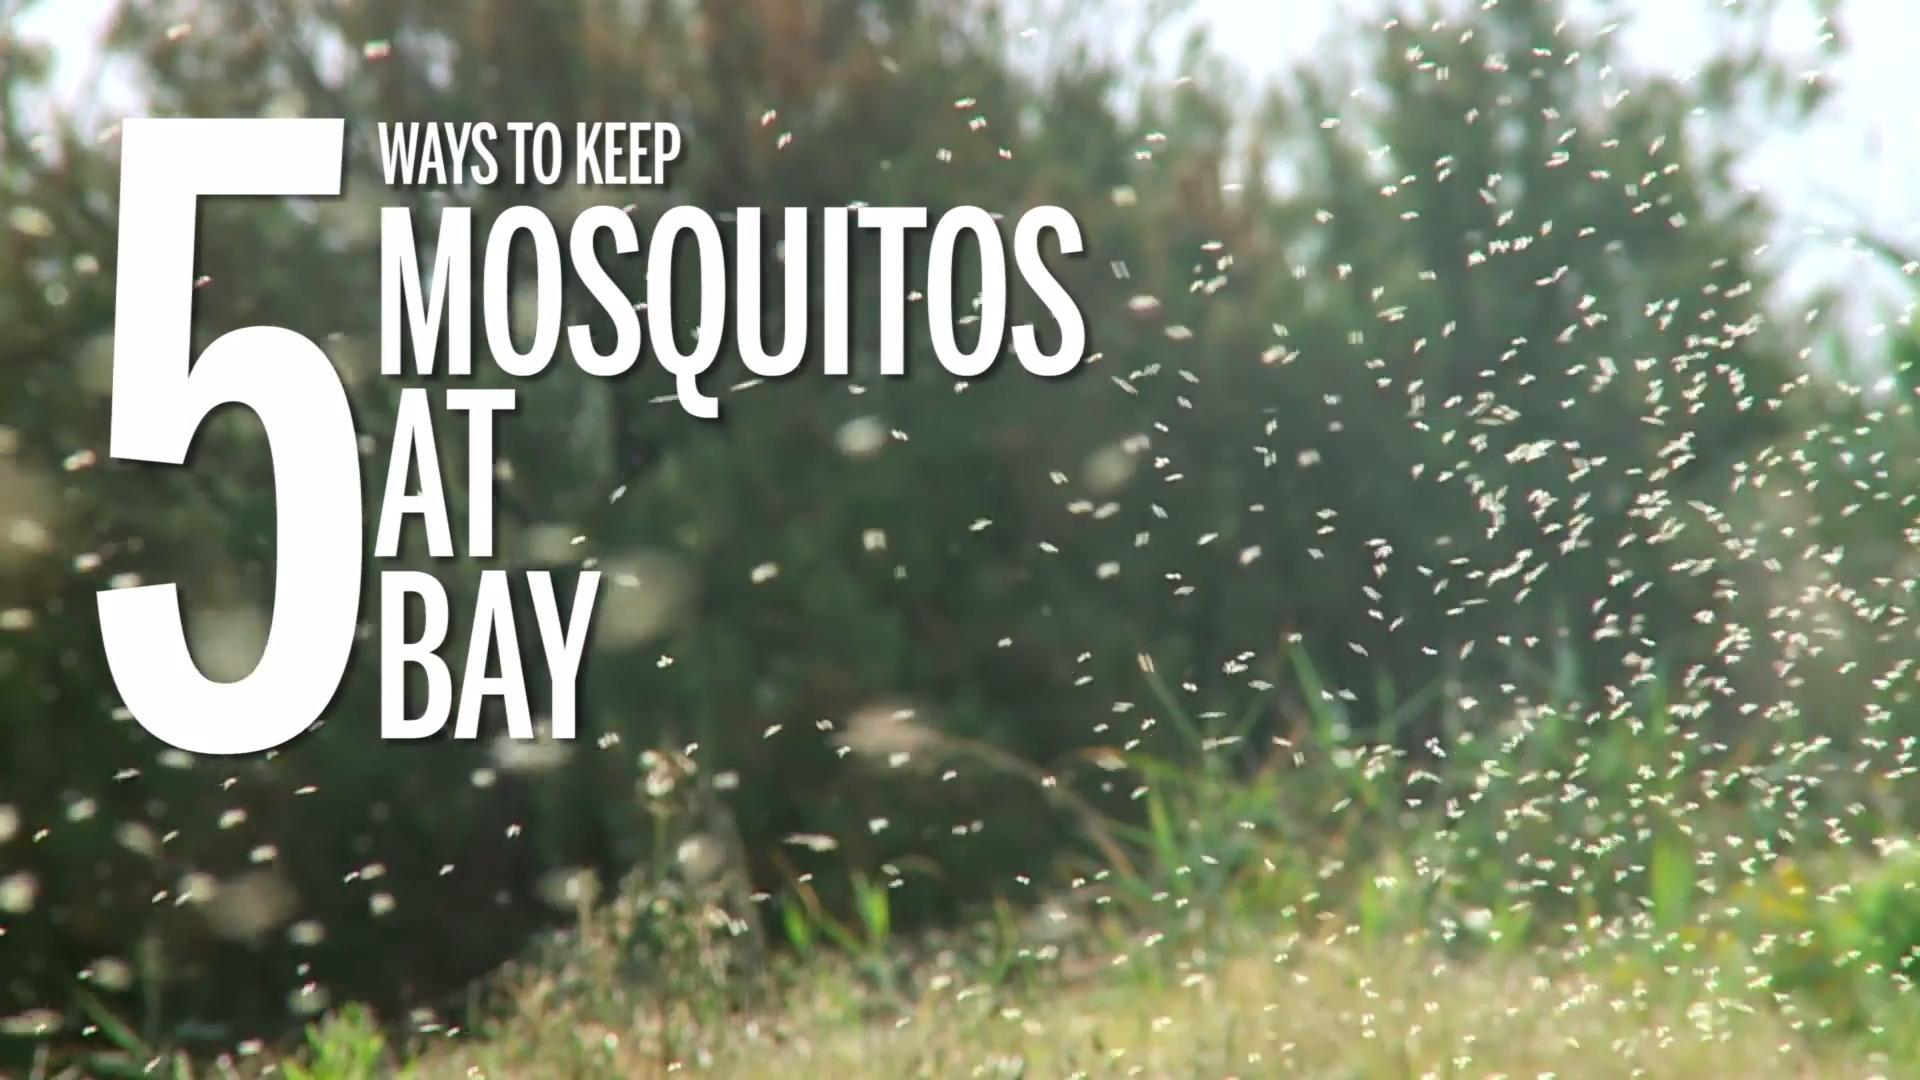 Types of fly bites: Horse fly bites